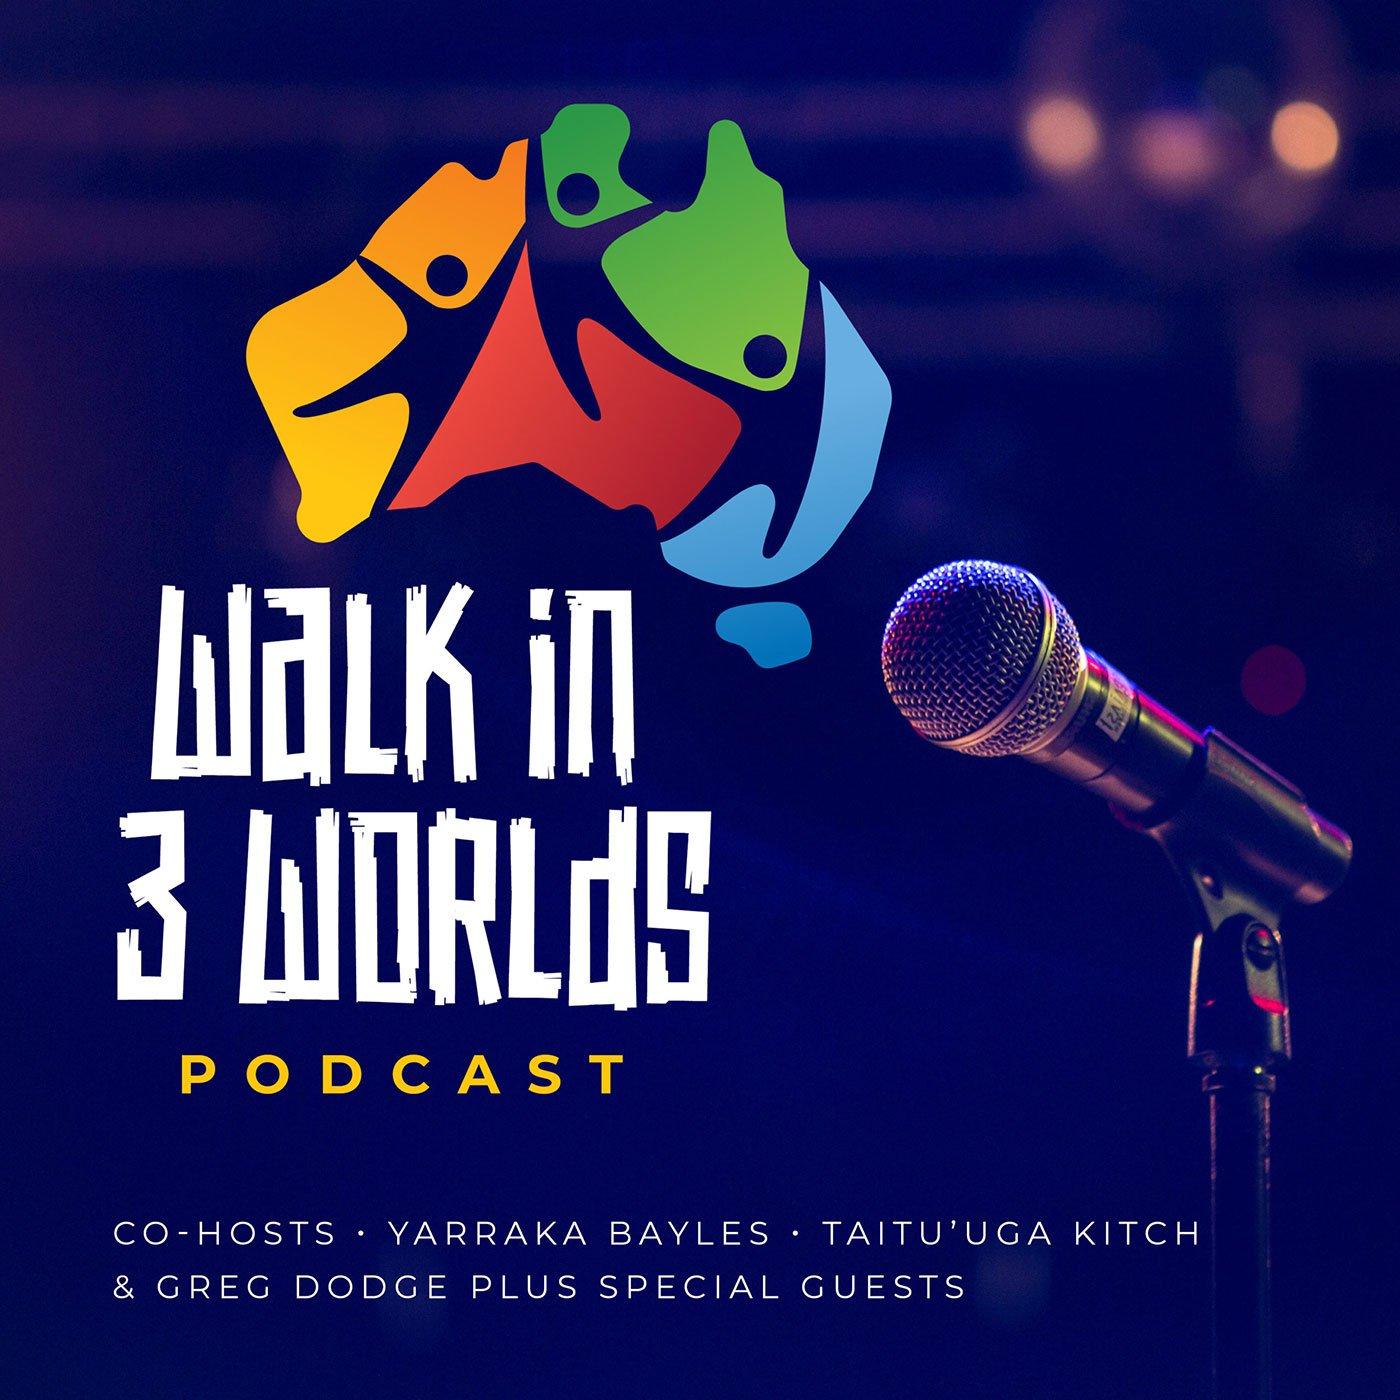 Walk in 3 Worlds Podcast